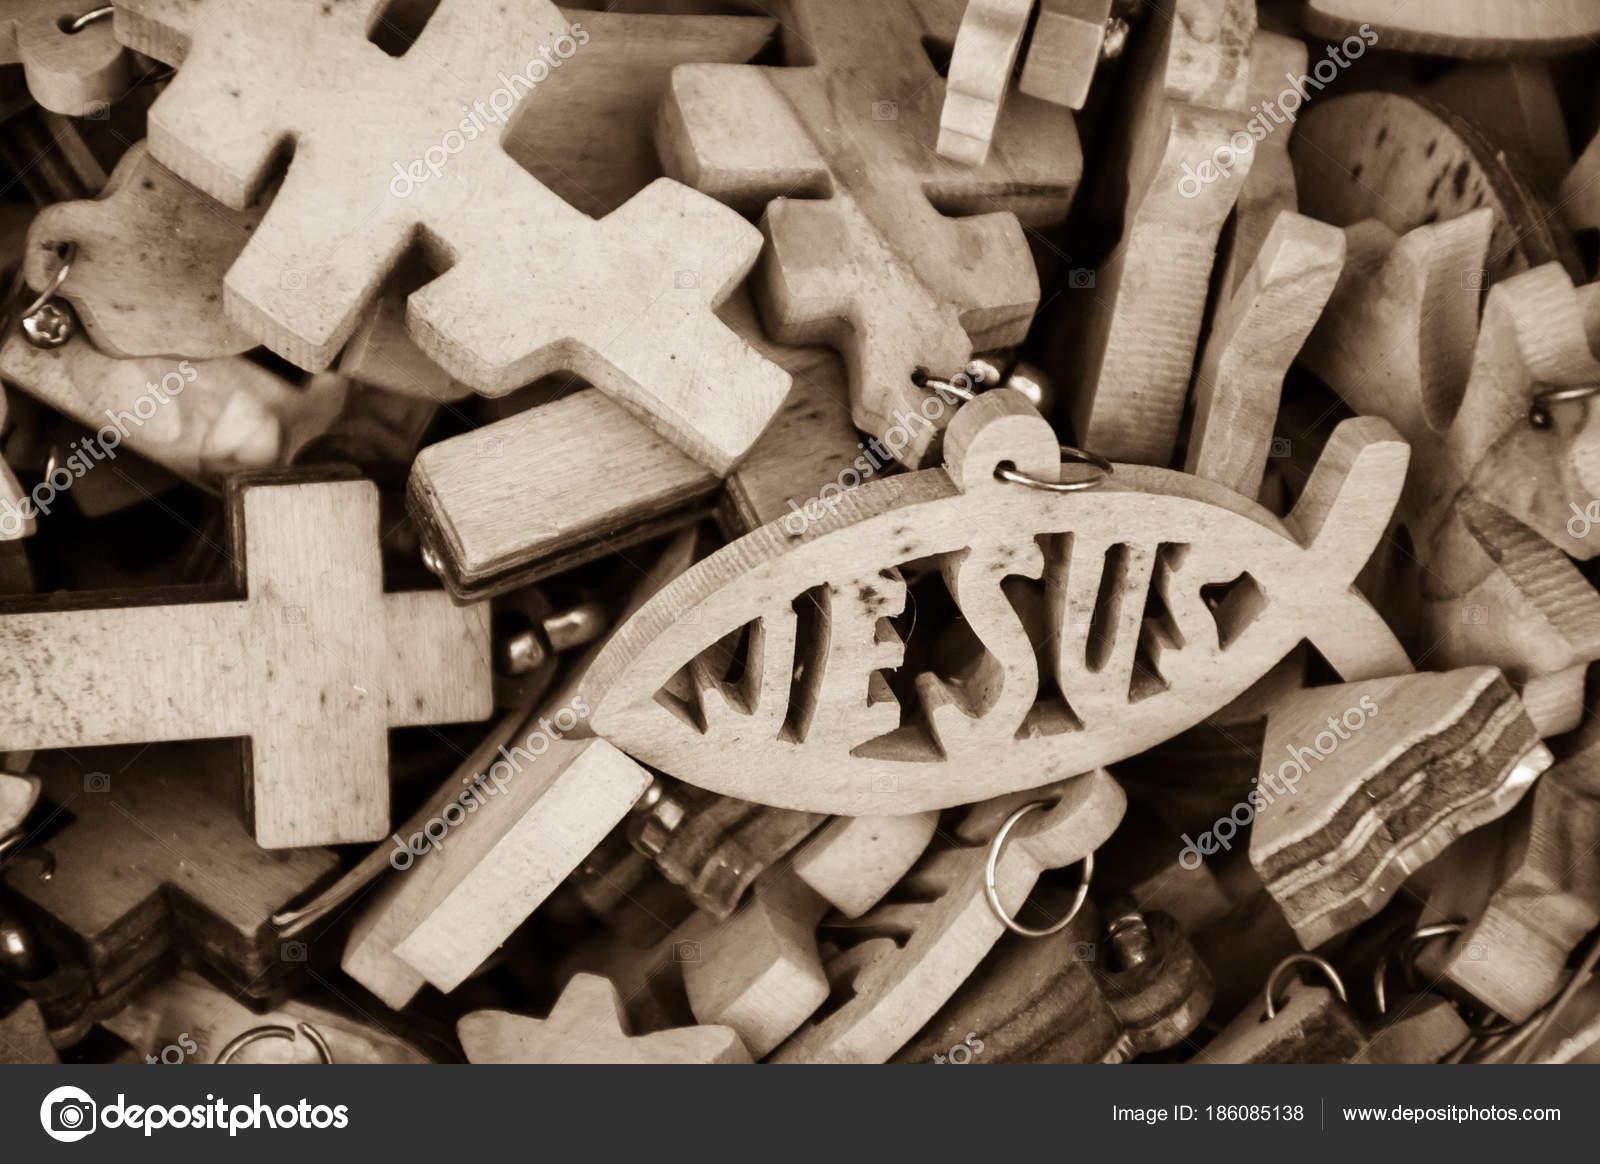 Different Wooden Crosses Jesus Fish Symbol Sale Market Old City